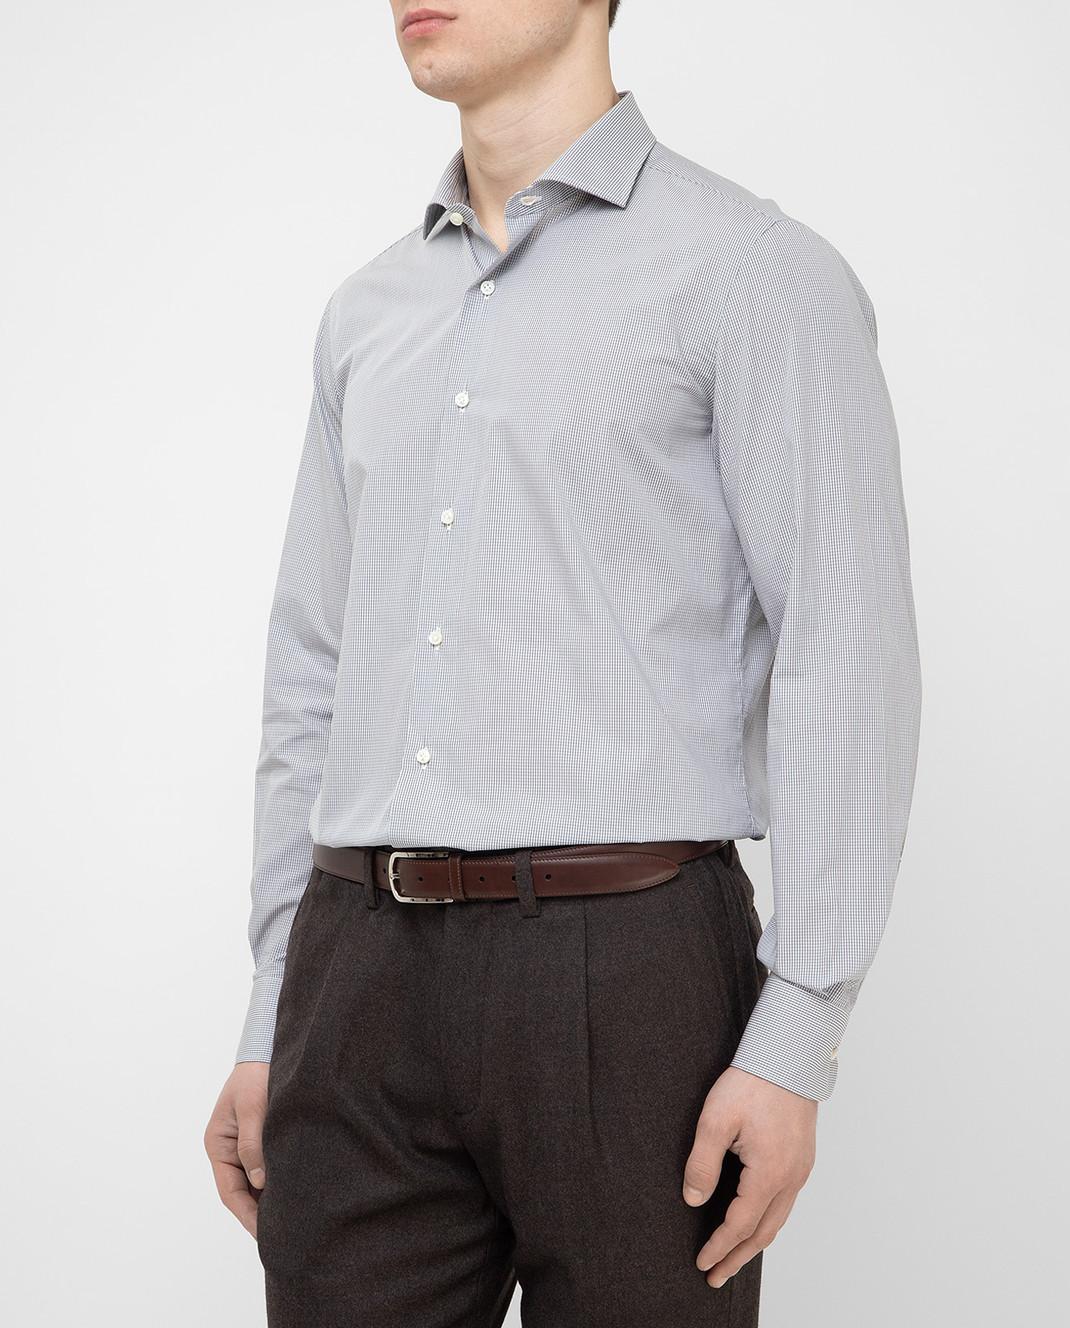 Luciano Lombardi Серая рубашка 990631 изображение 3